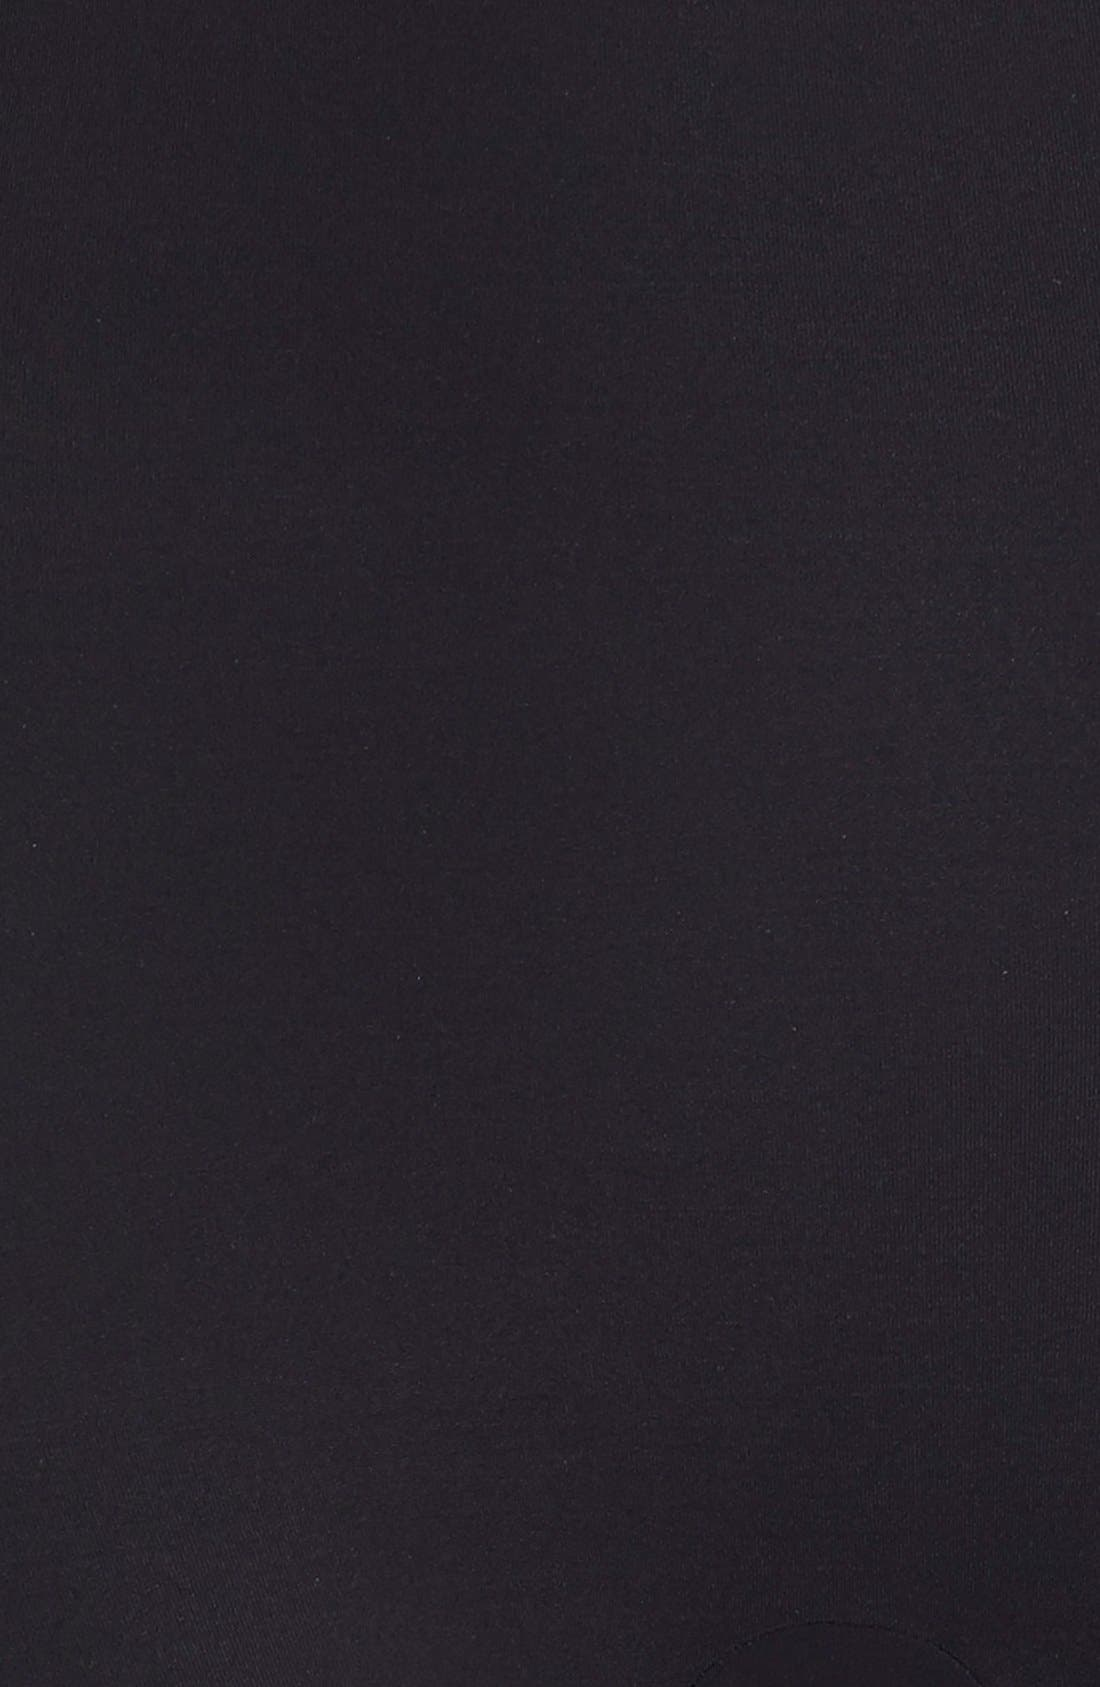 COMMANDO, 'Control' High Waist Shaping Shorts, Alternate thumbnail 4, color, BLACK